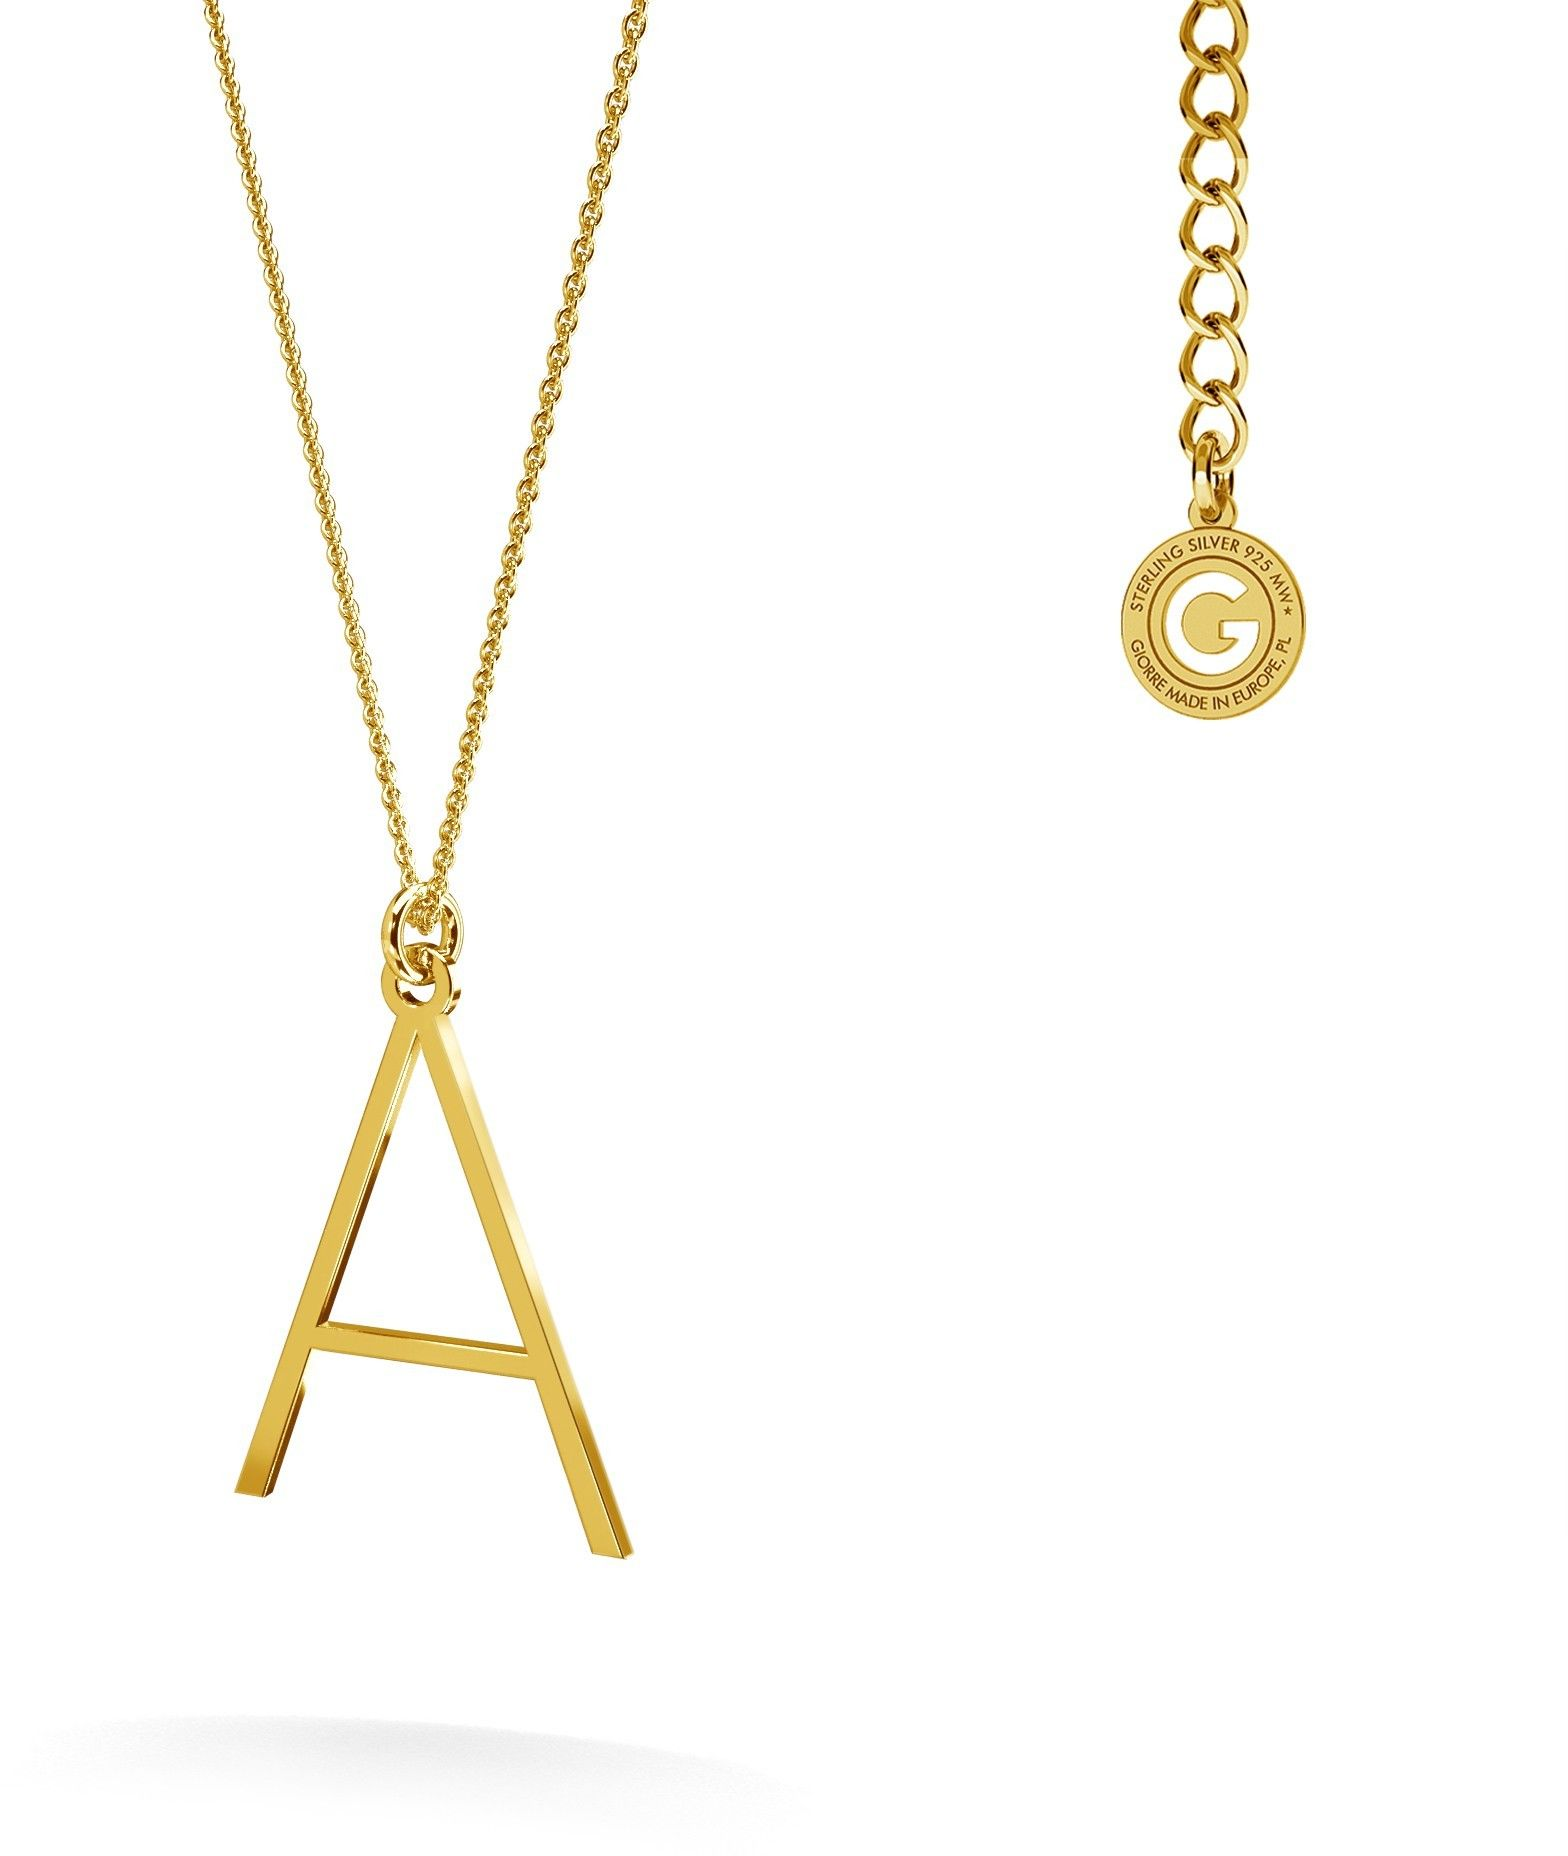 Srebrny naszyjnik z literką, alfabet, srebro 925 : Litera - V, Srebro - kolor pokrycia - Pokrycie platyną